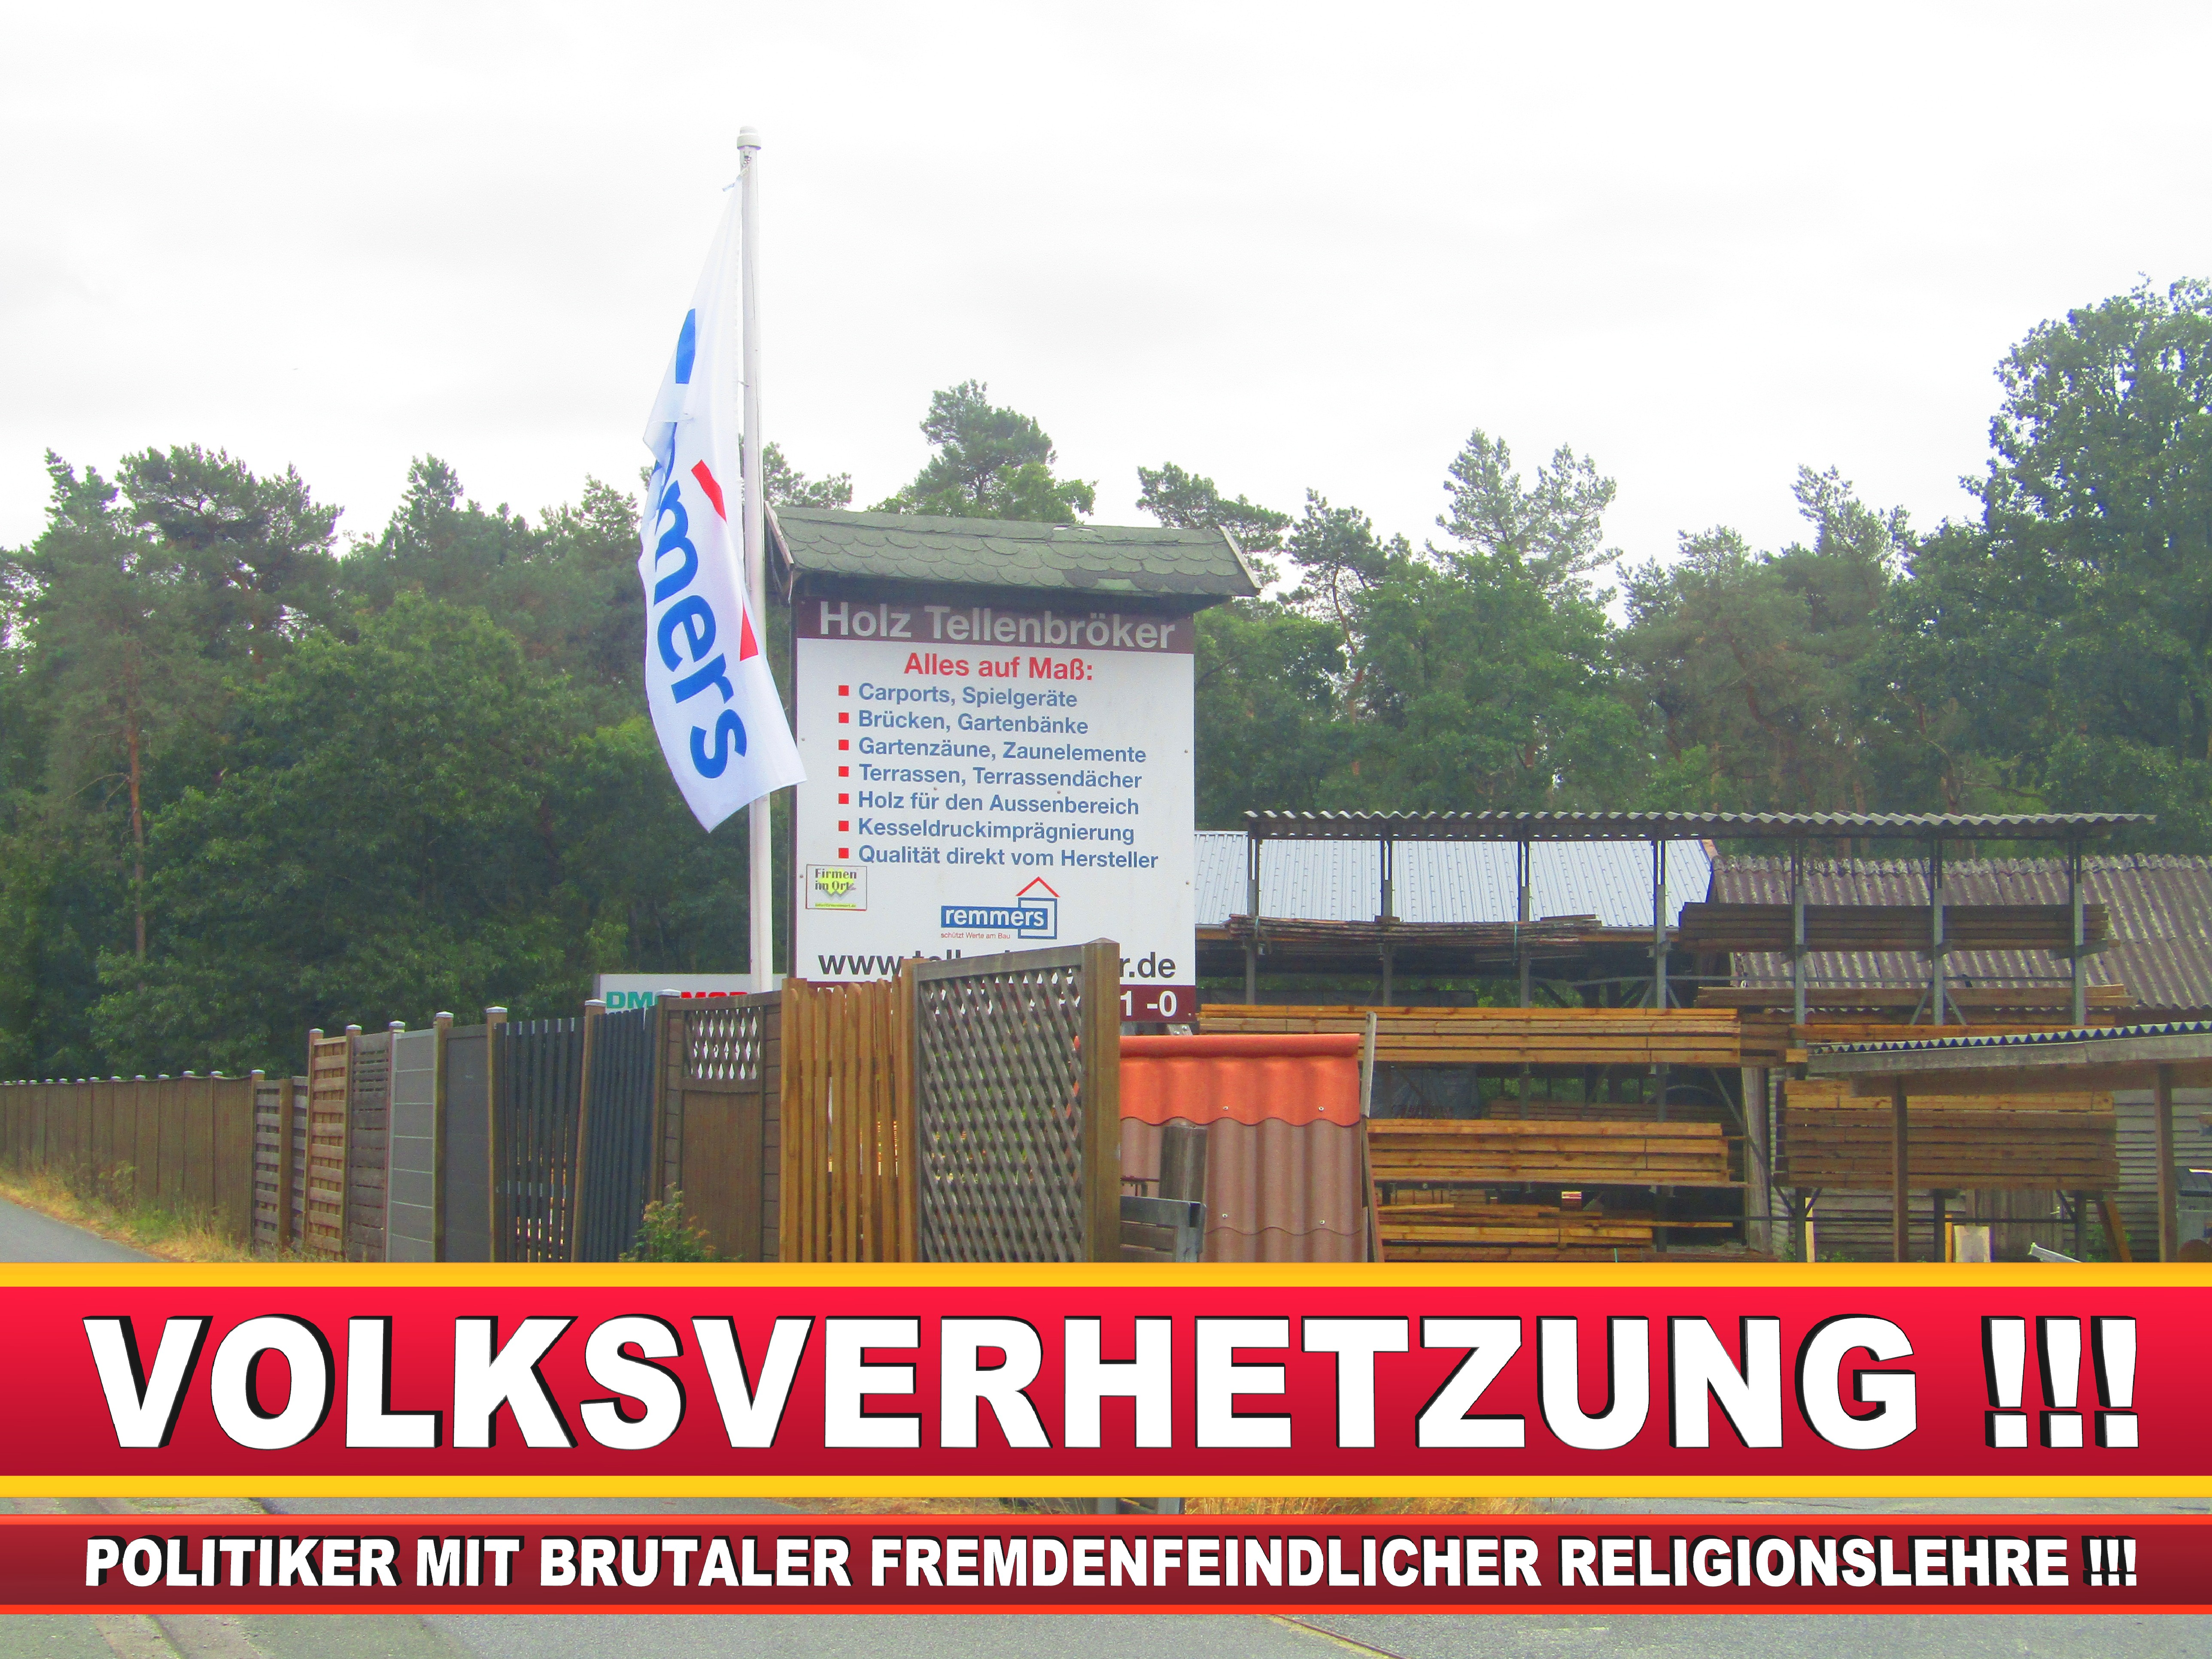 HOLZ TELLENBRÖKER CDU BIELEFELD PADERBORNER STR 224 BIELEFELD BI (5) LANDTAGSWAHL BUNDESTAGSWAHL BÜRGERMEISTERWAHL